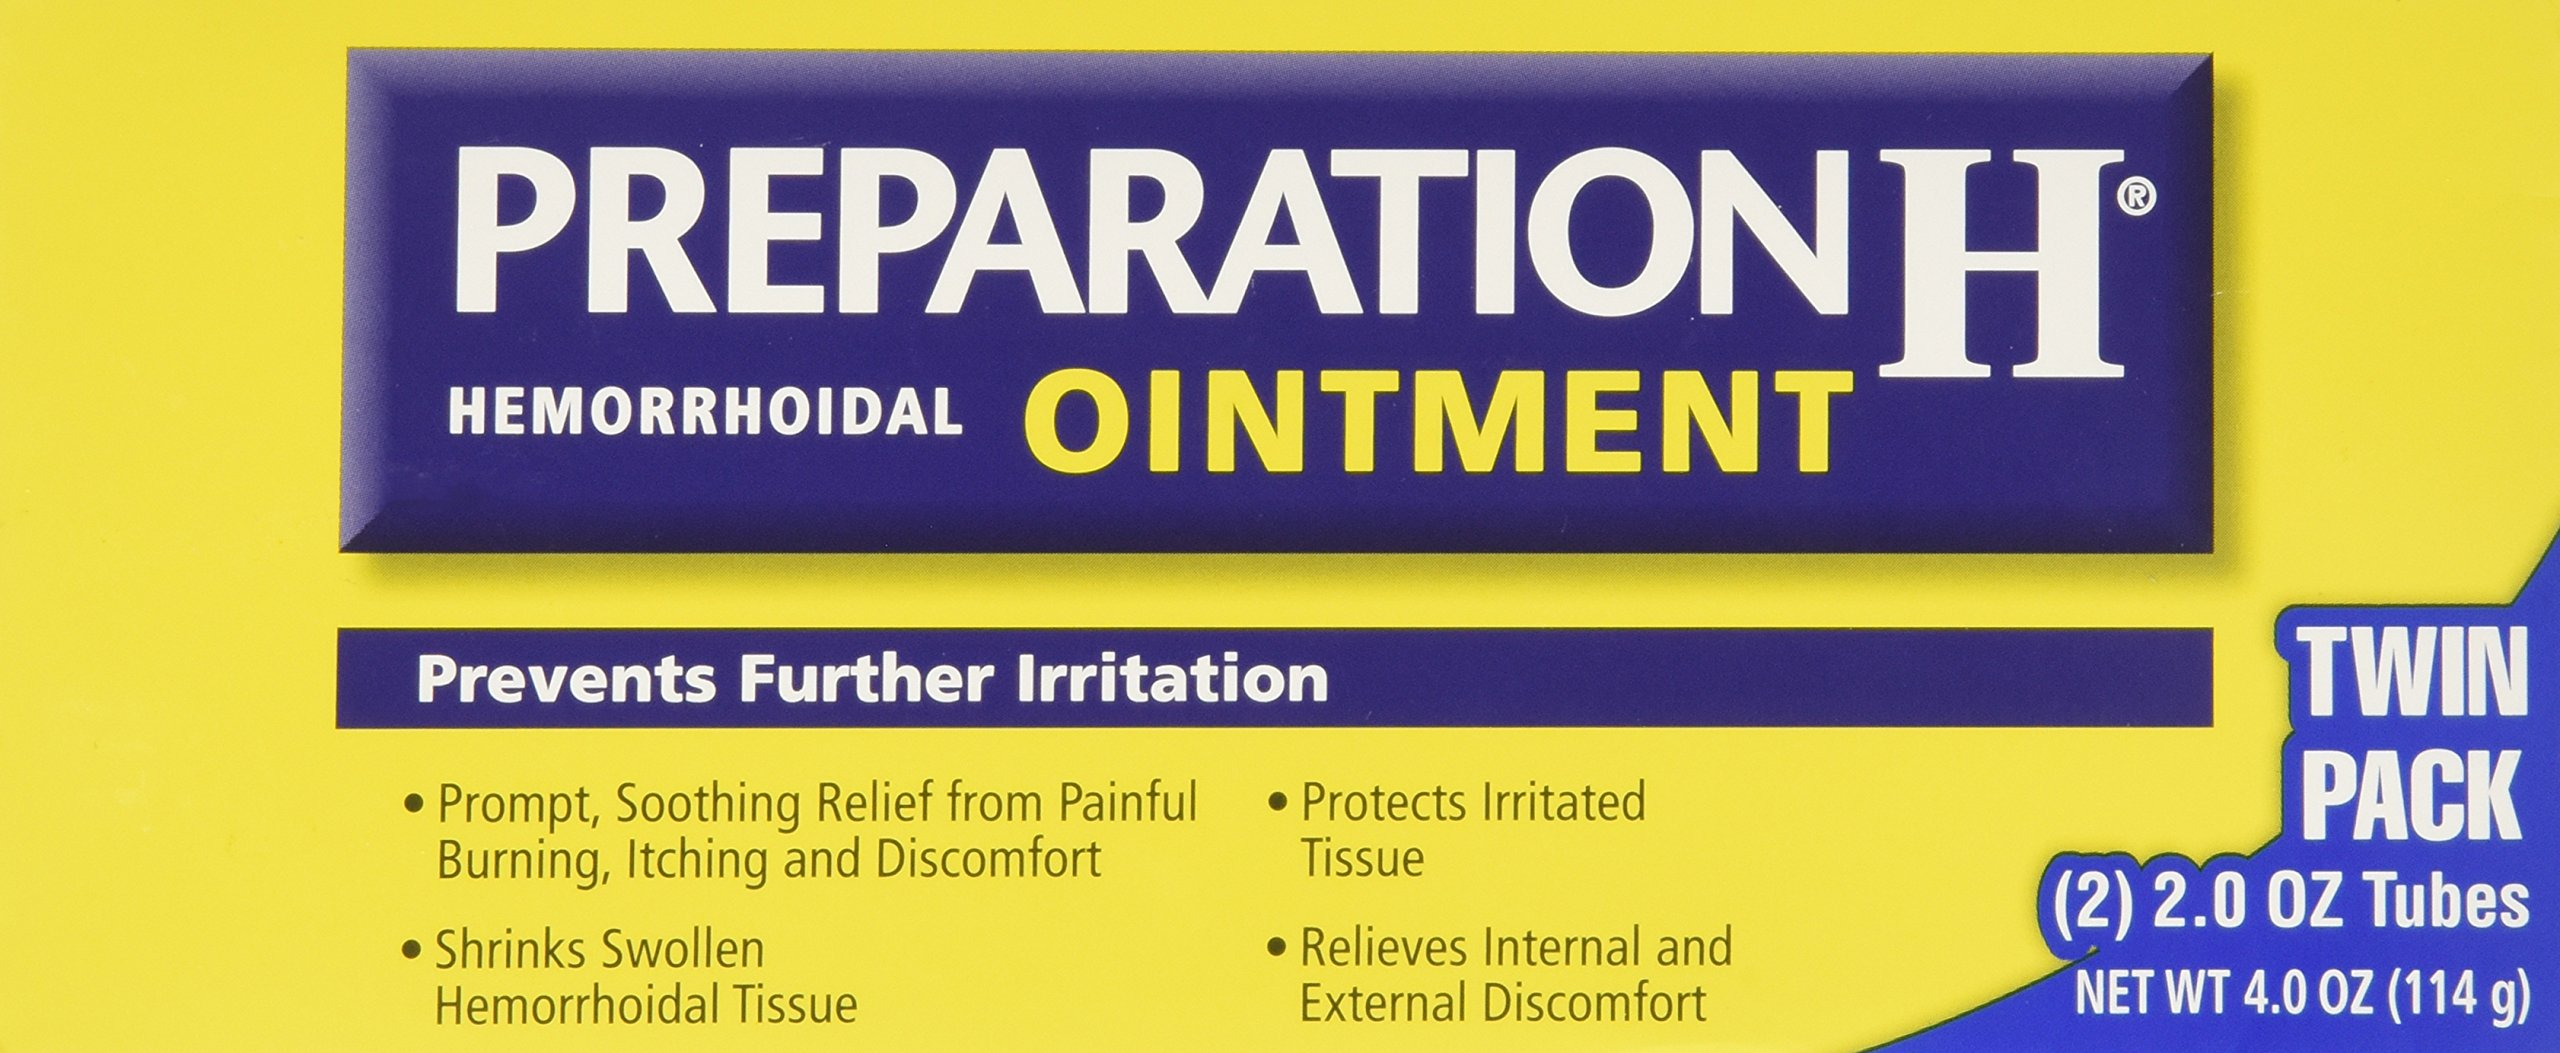 Preparation H Hemorrhoidal Ointment - 4 oz TOTAL (2 oz x 2 tubes) by Preparation H